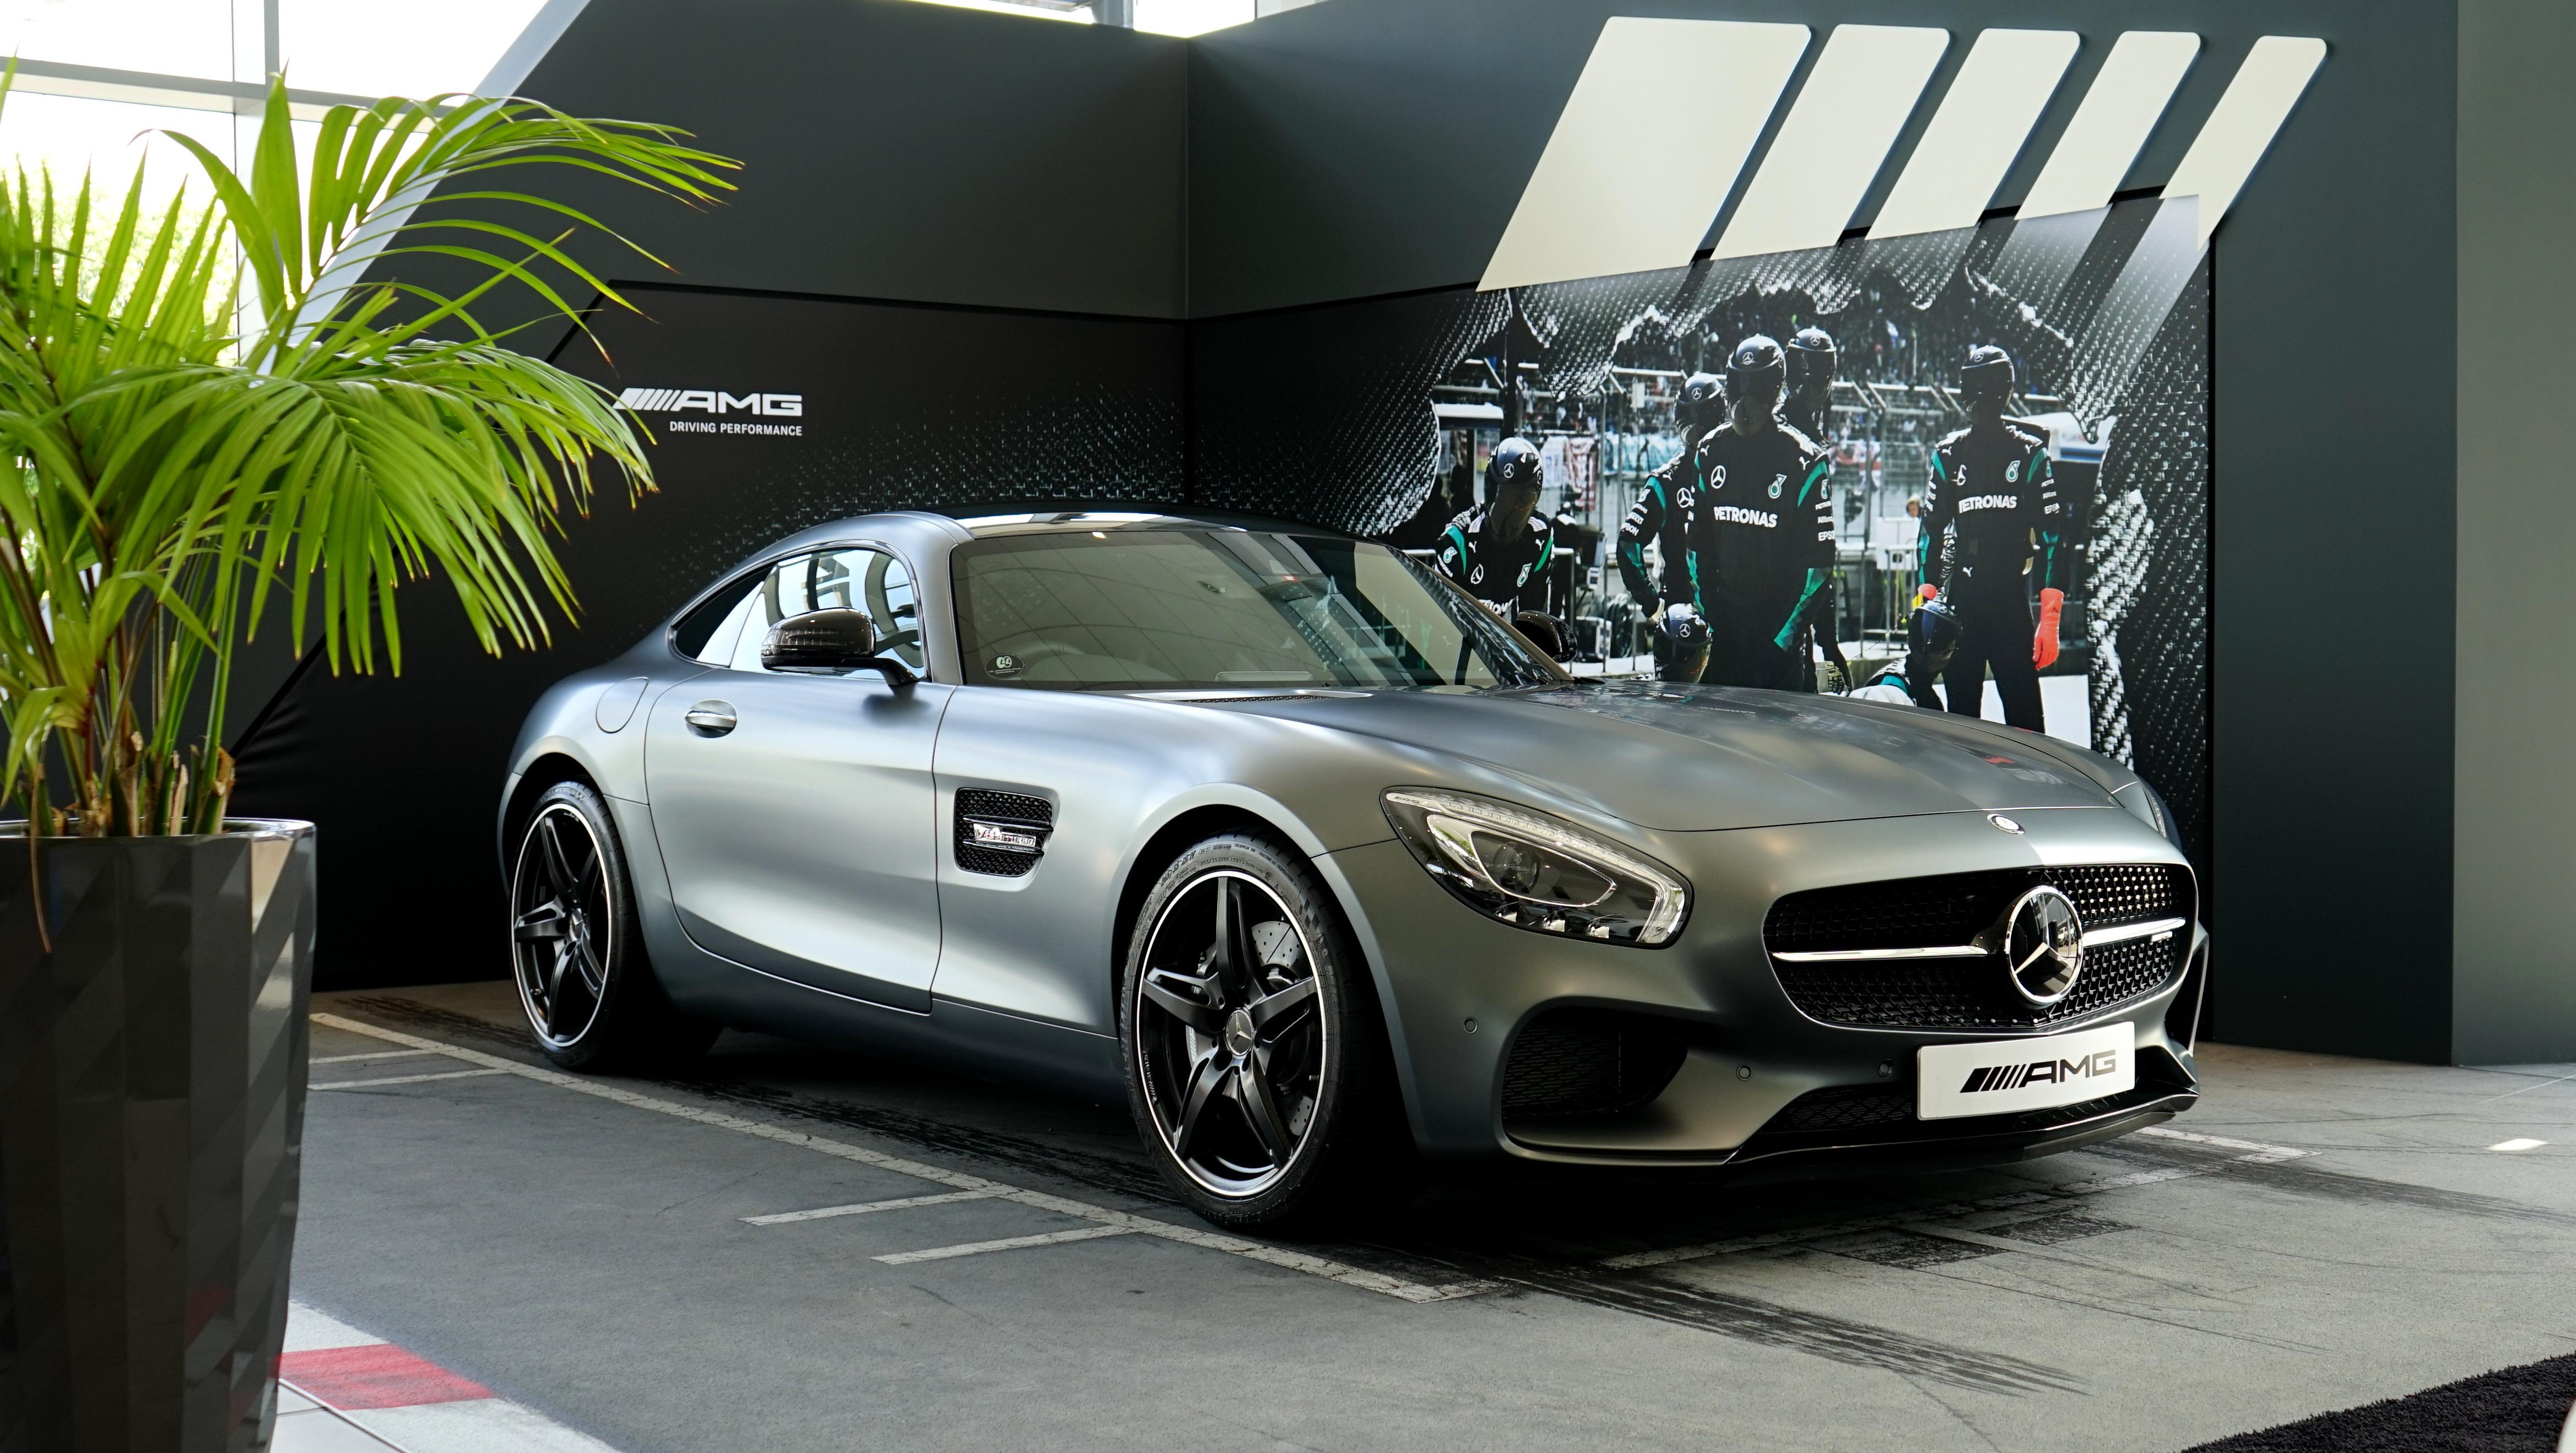 Alpha Coders Car Wallpapers Mercedes Benz Amg In The Showroom 4k Ultra Hd Wallpaper